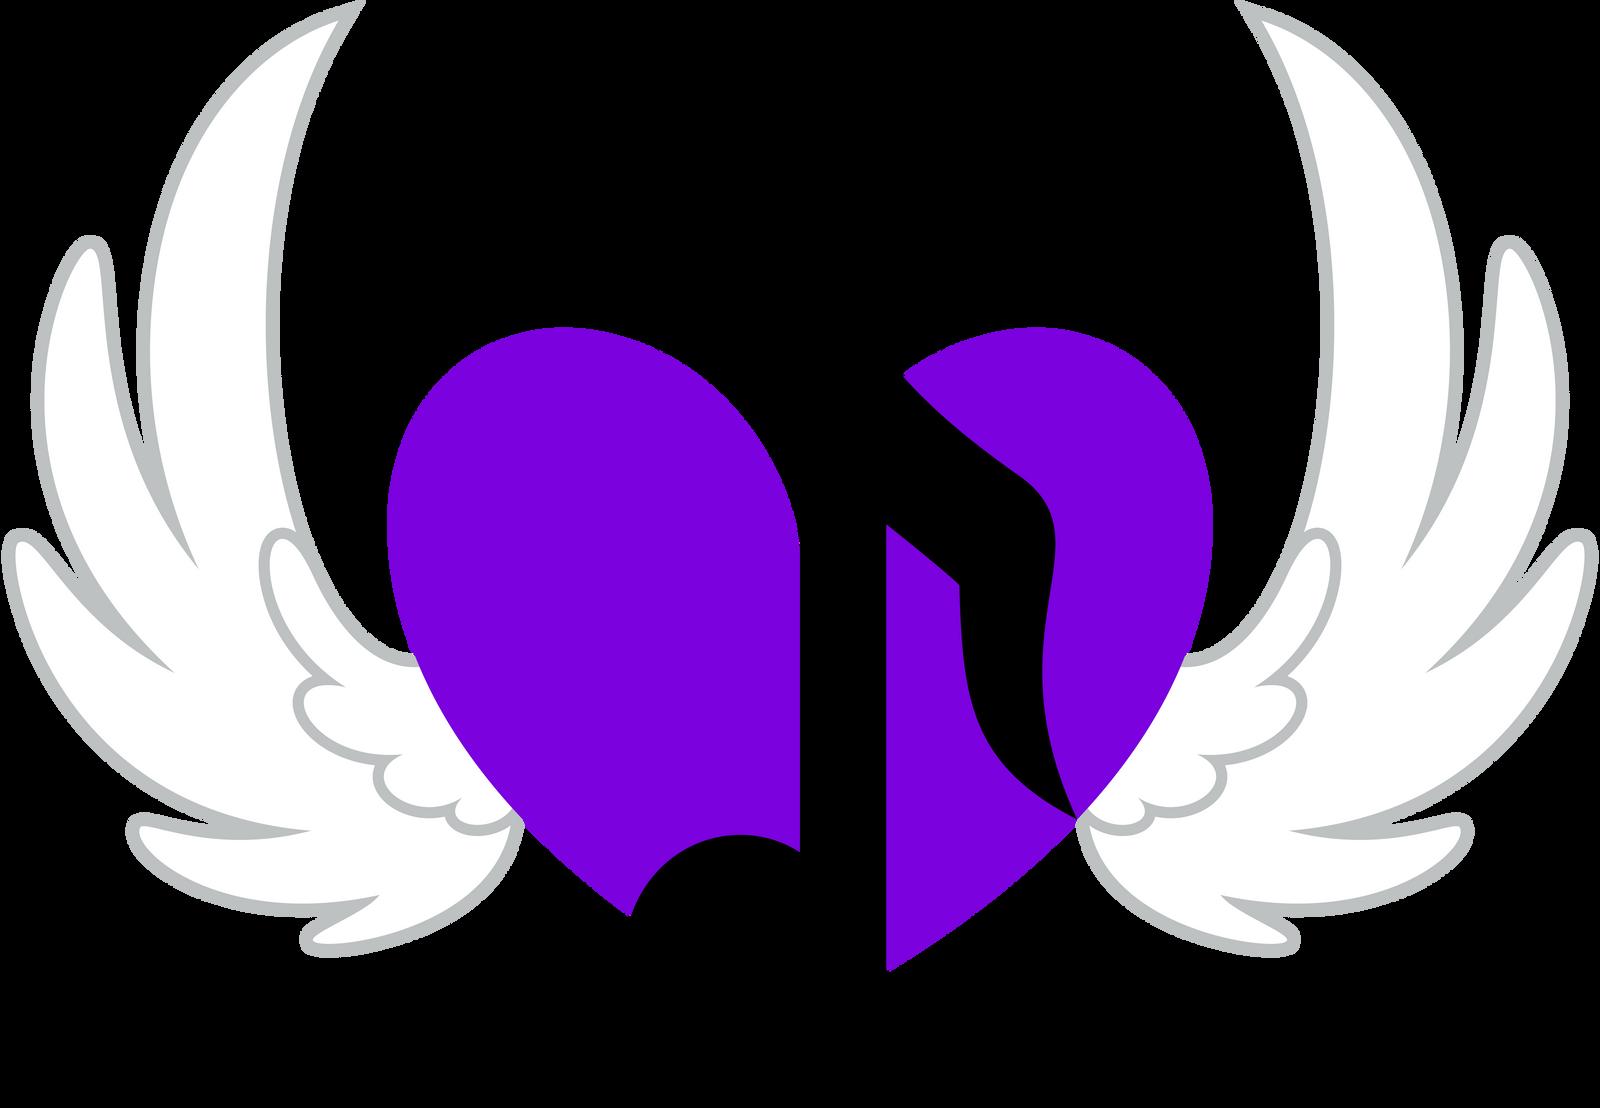 Skypaw cutie marks by Turbo740 on DeviantArt |Mlp Random Cutie Marks